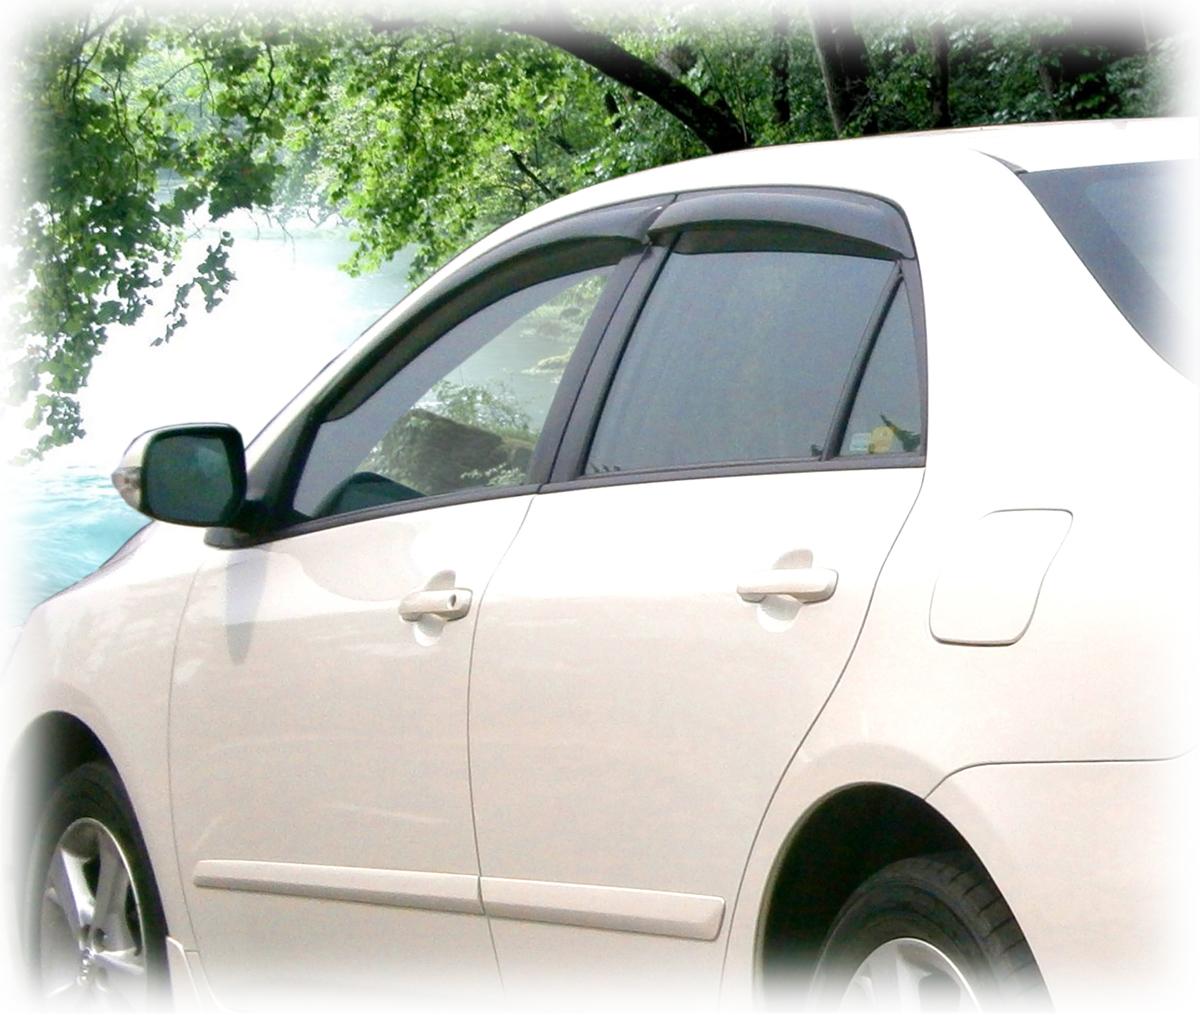 Window Visor Rain Guards To Fit Toyota Corolla Years 2014